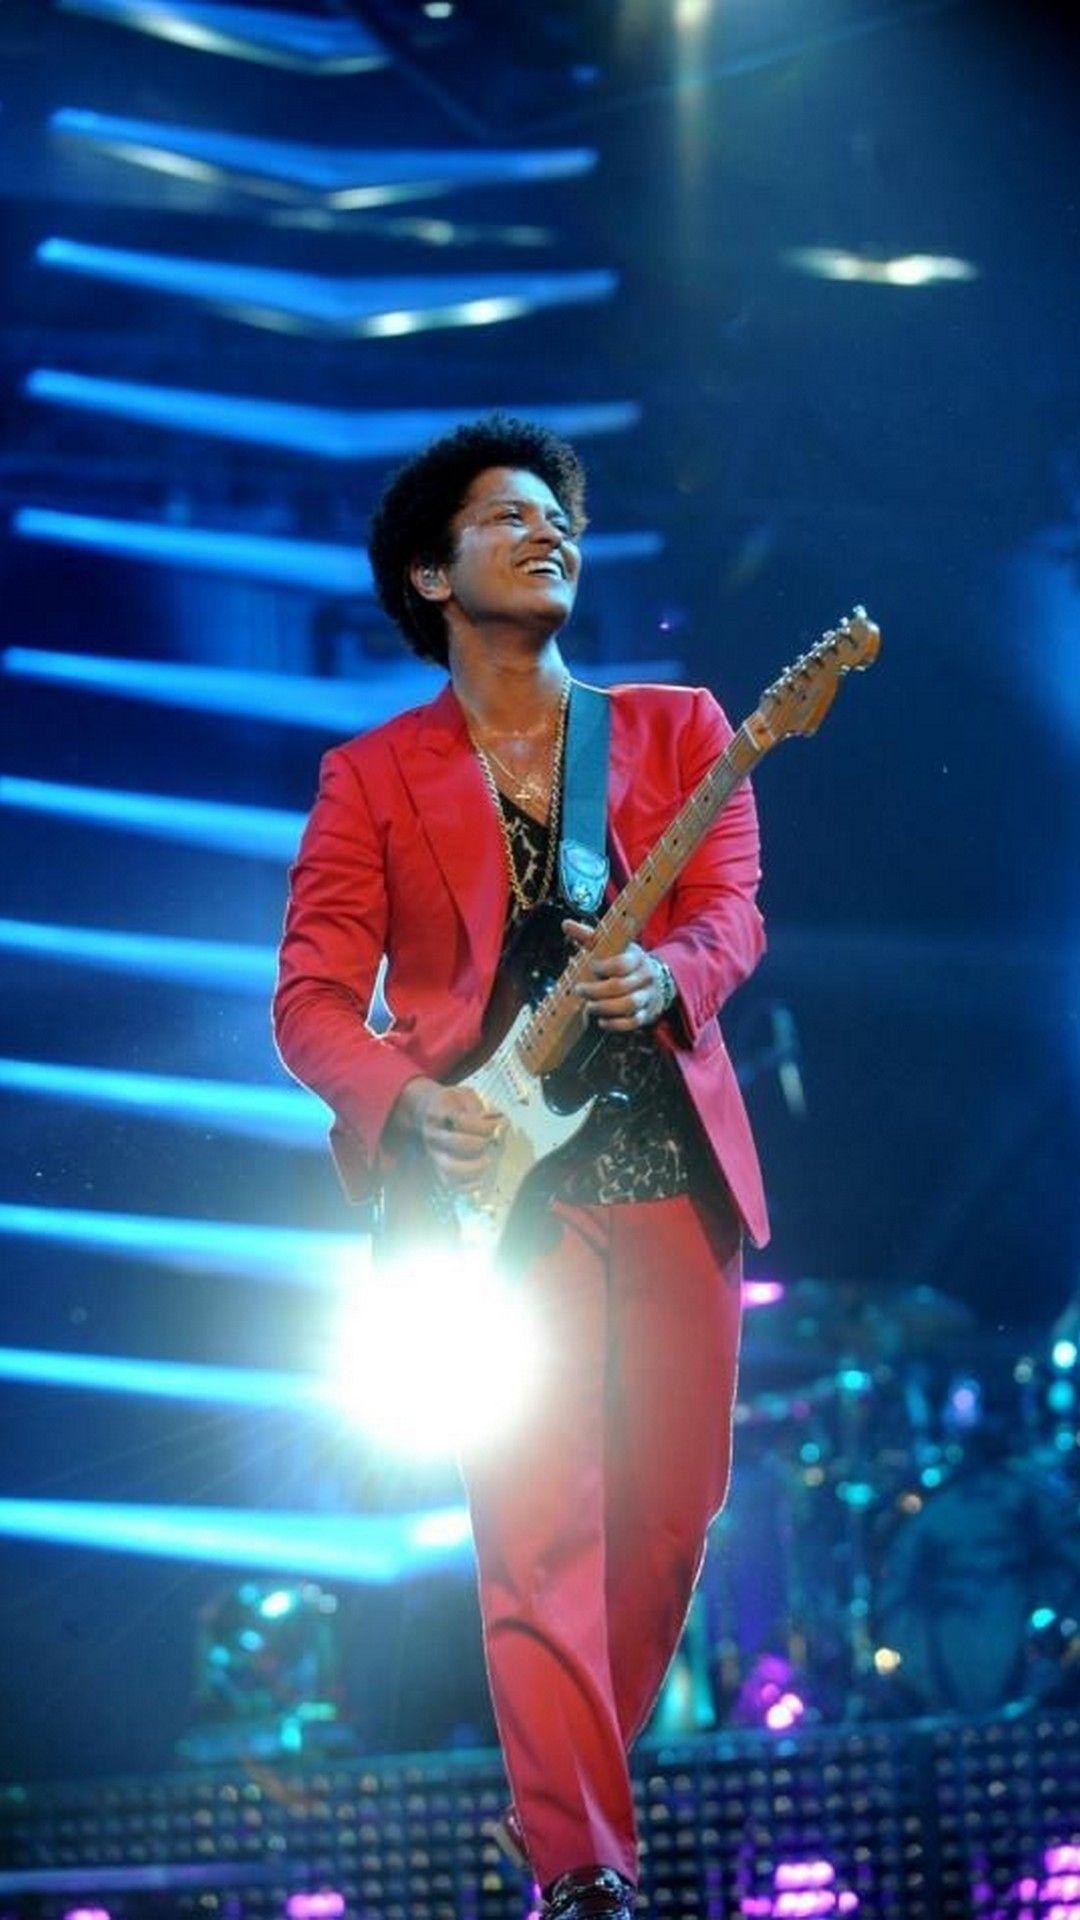 Wallpaper Bruno Mars Concert Iphone Best Iphone Wallpaper Bruno Mars Concert Bruno Mars Bruno Mars Grammys